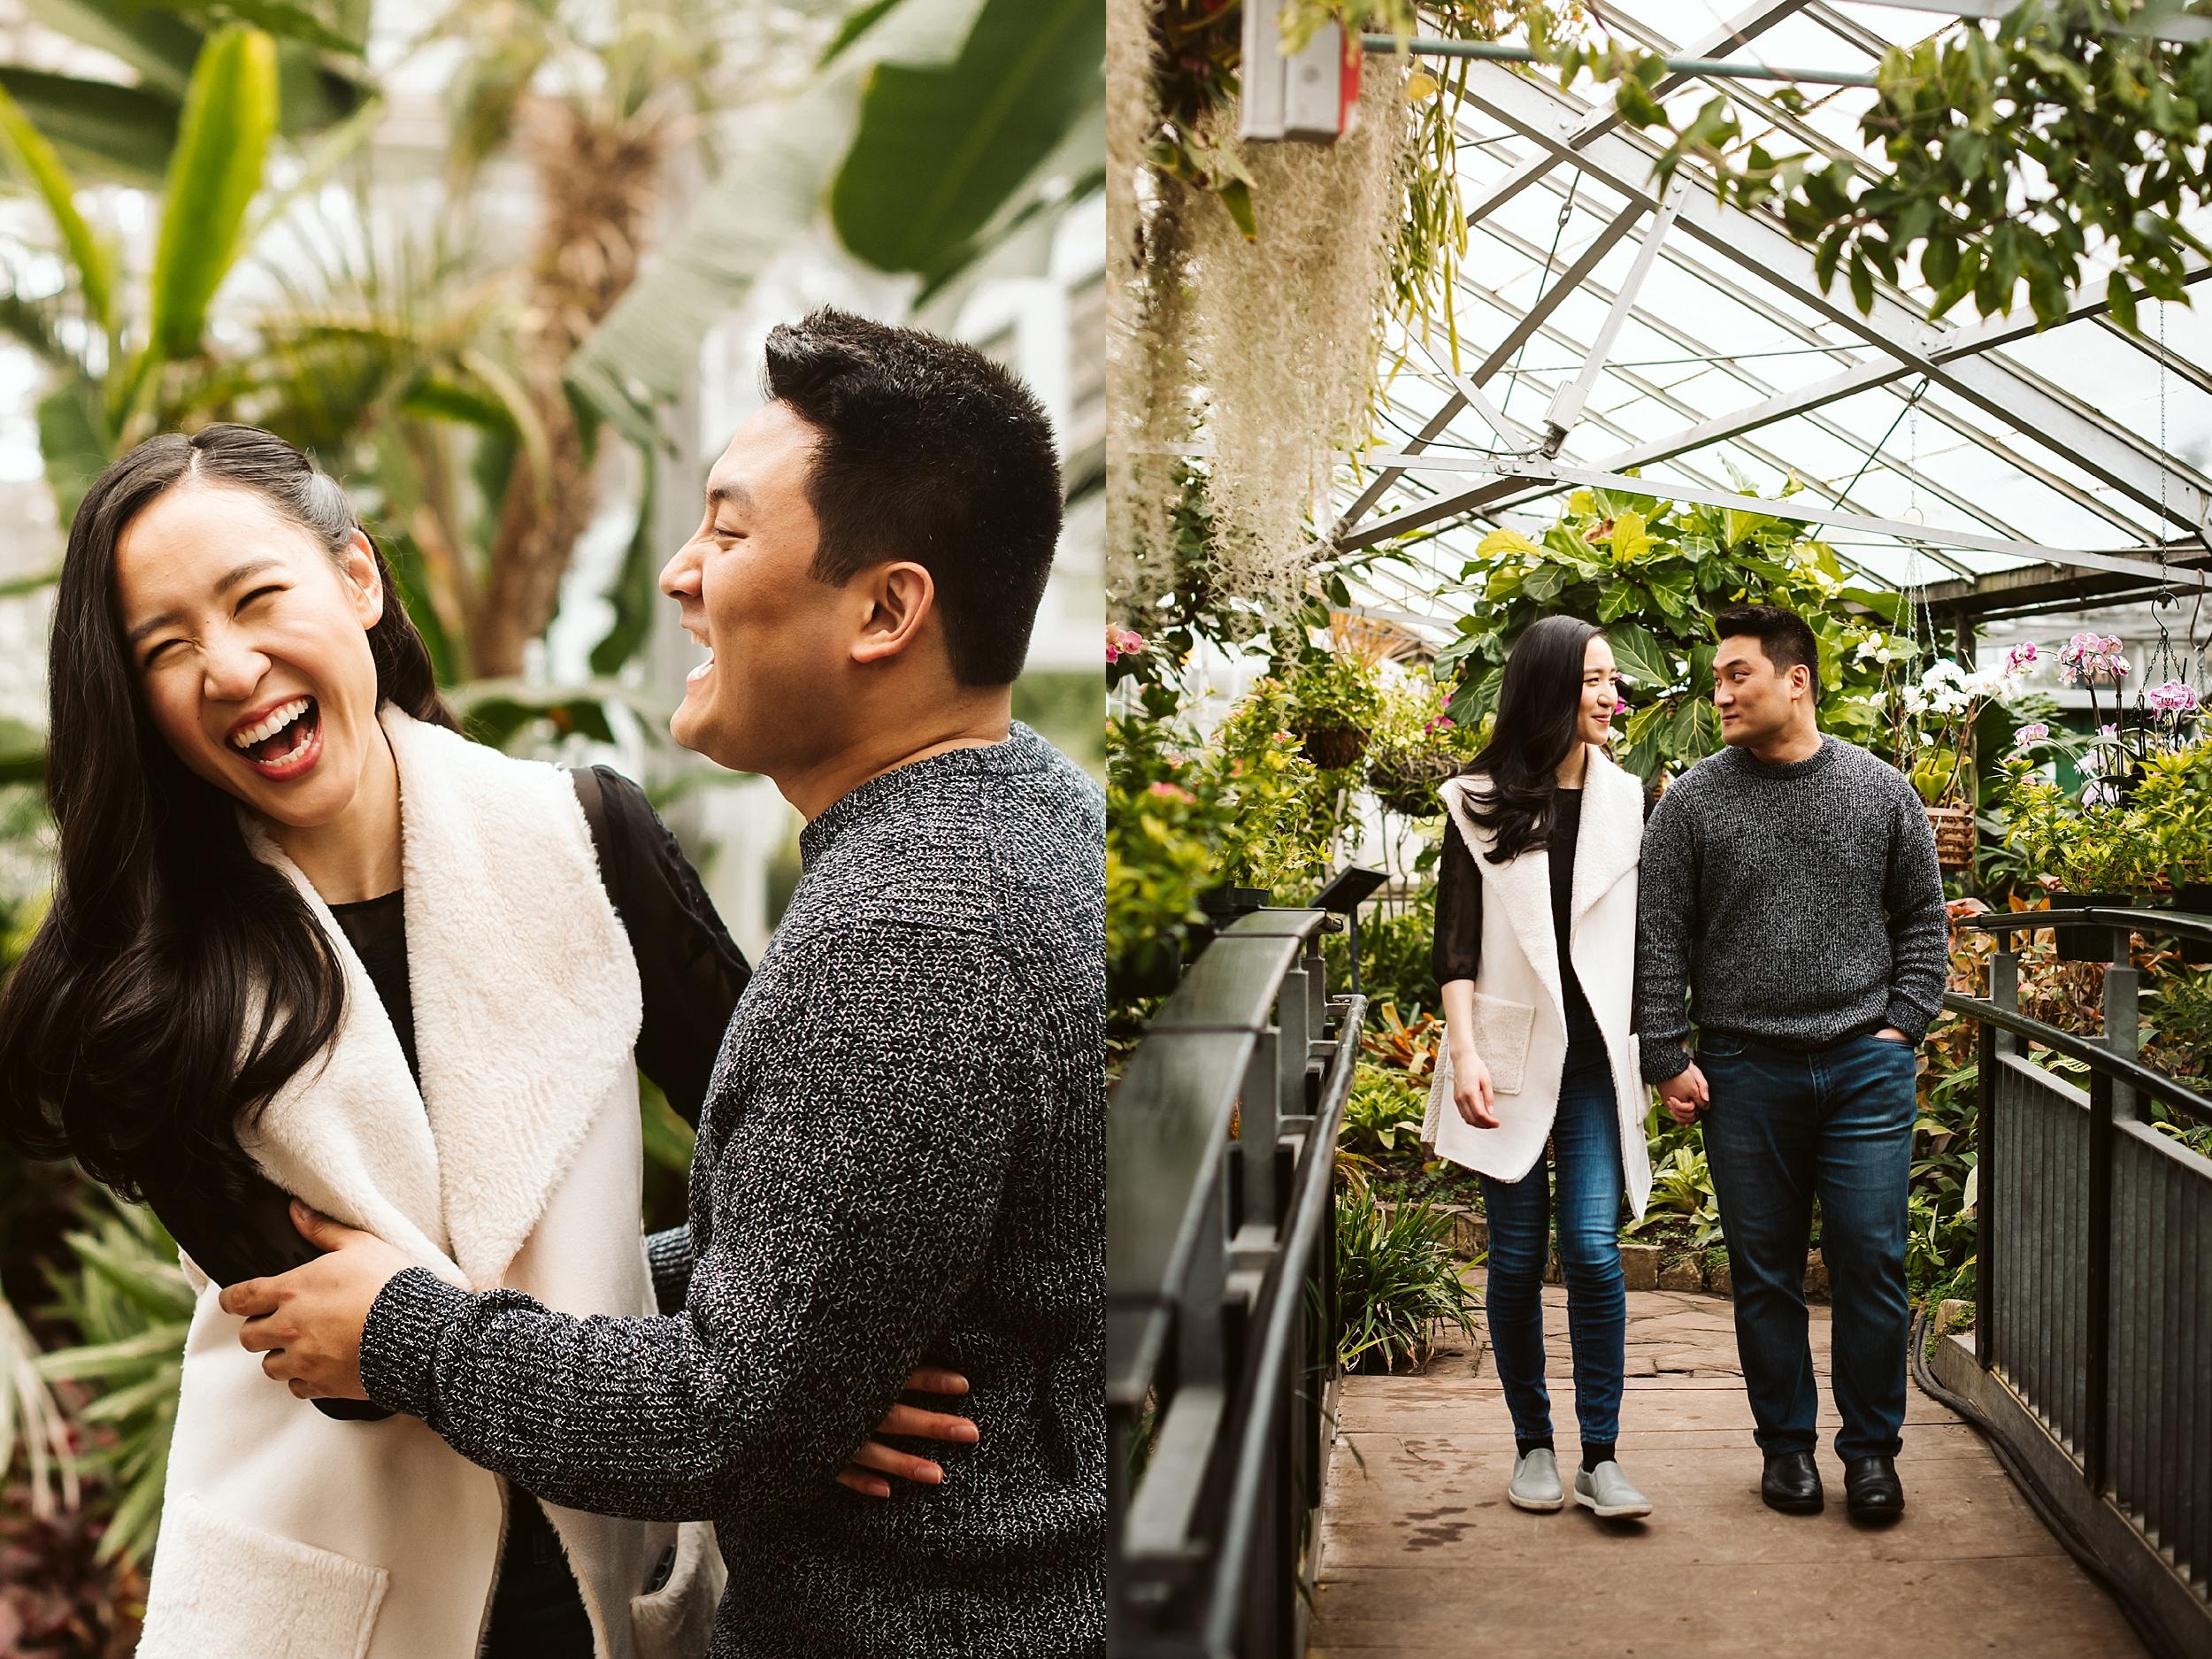 Allan_Gardens_Engagement_Shoot_Toronto_Wedding_Photographer_0002.jpg